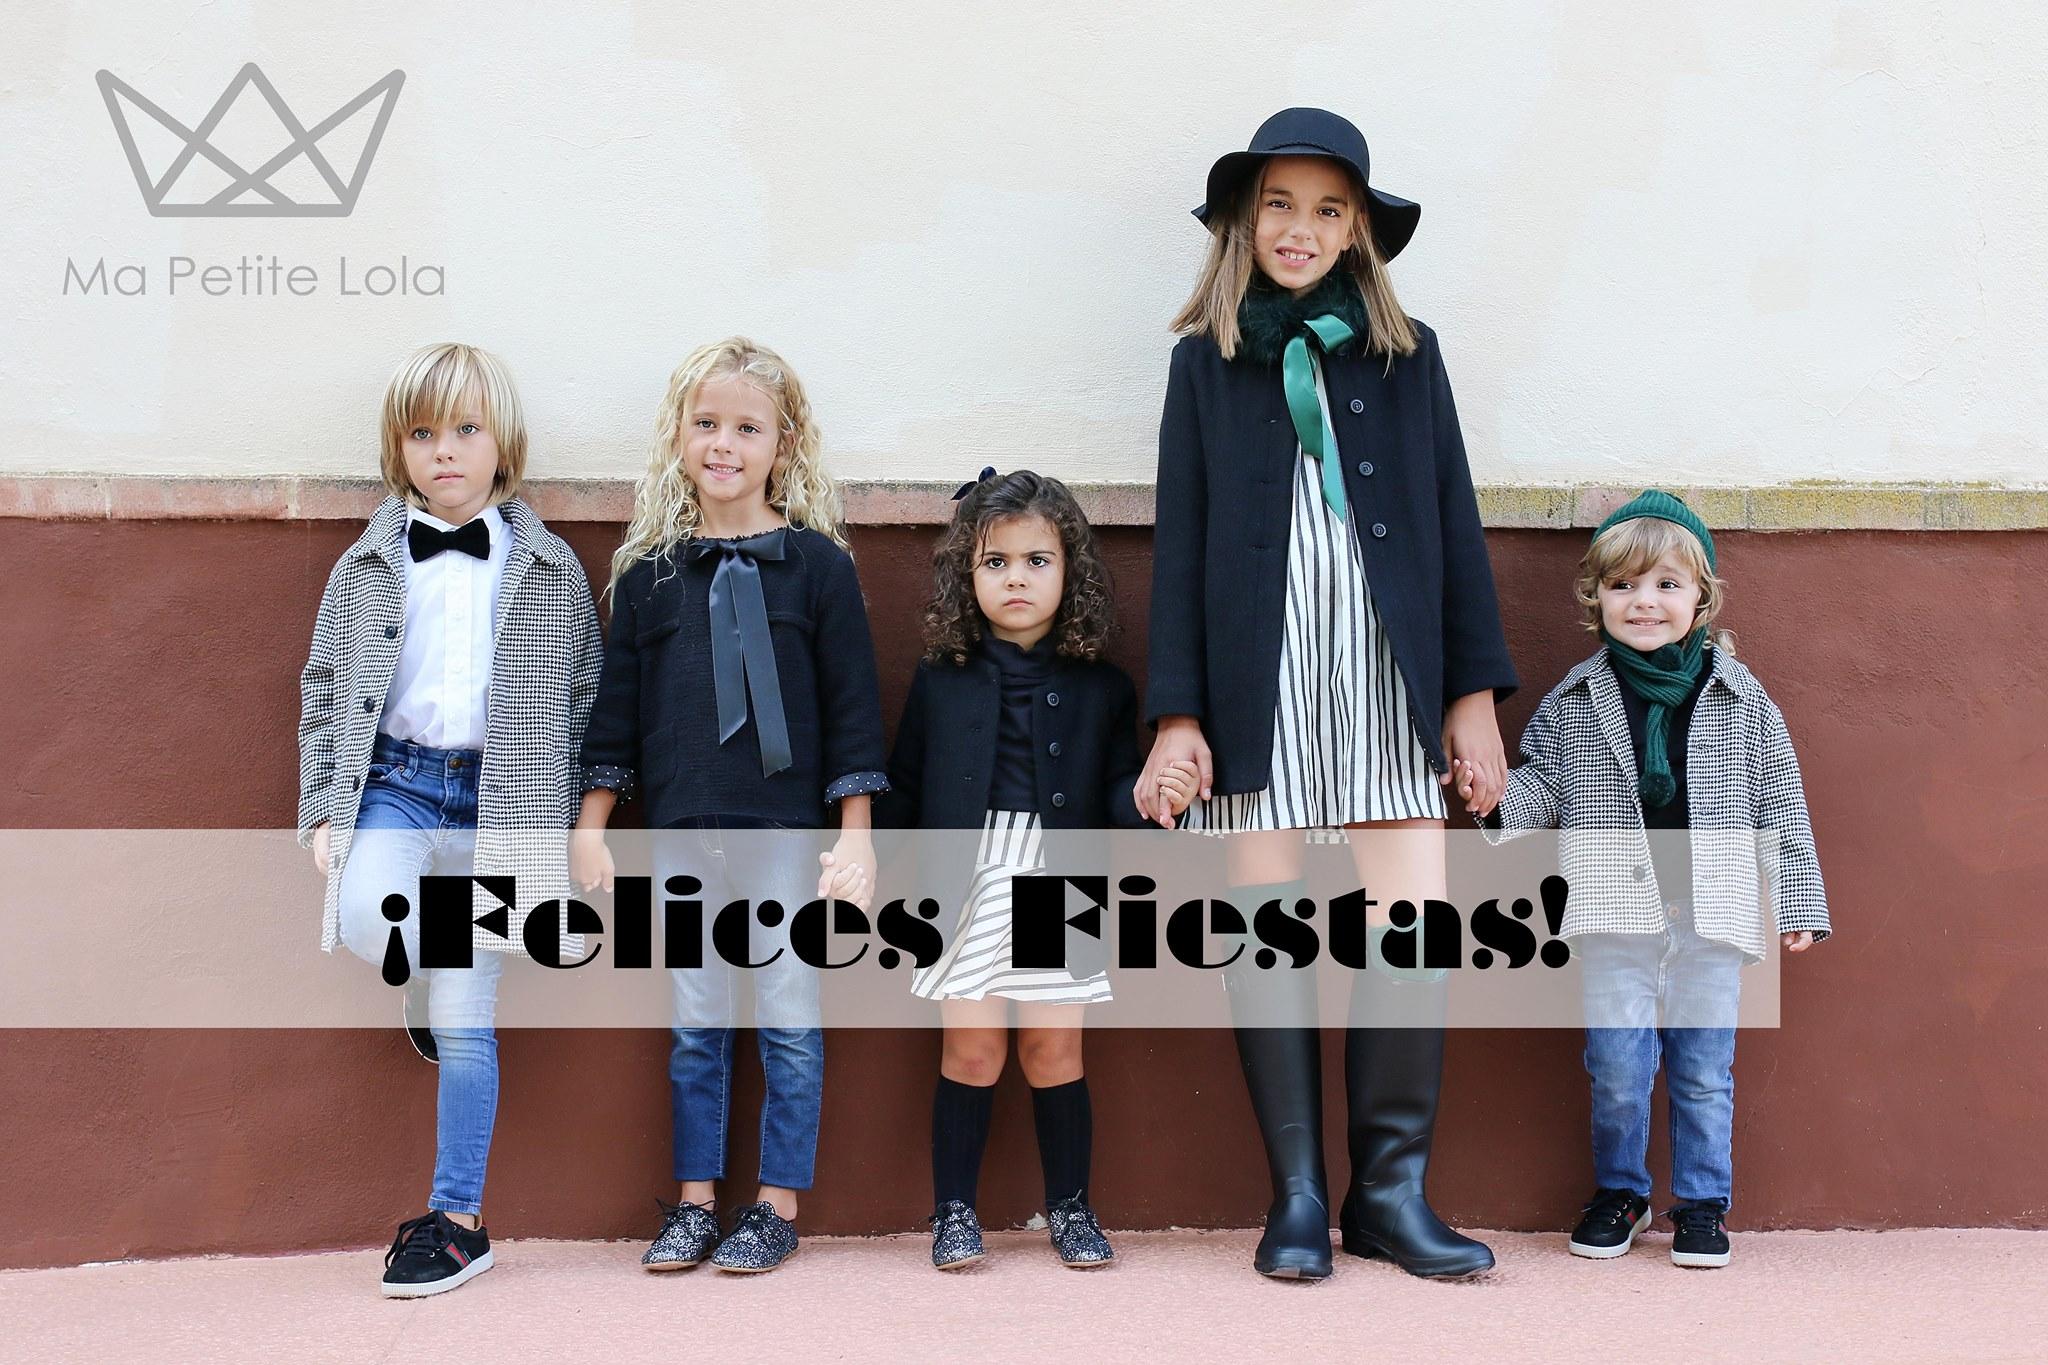 Moda infantil Navidades, ropa infantil de vestir, Ma Petite Lola